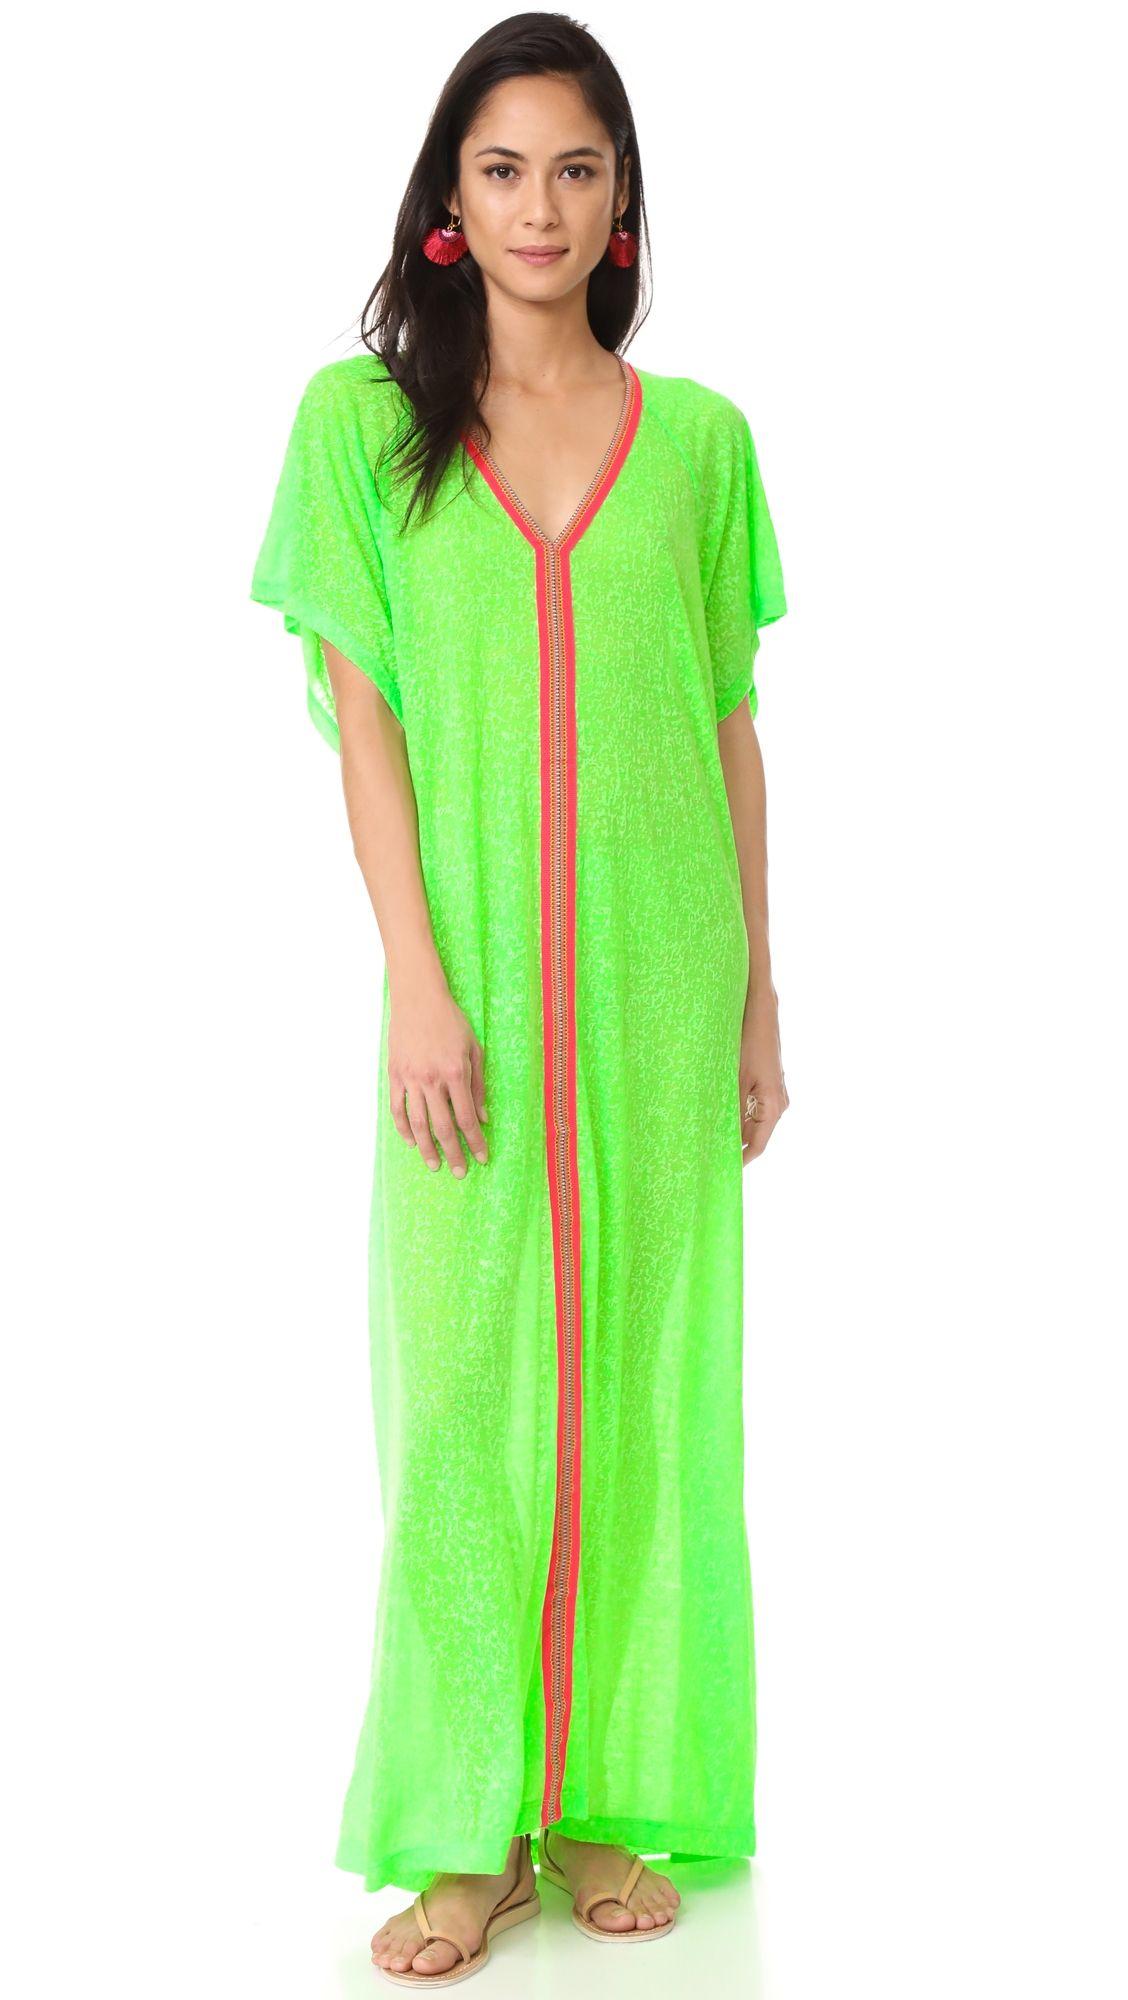 Pitusa abaya maxi dress products pinterest products